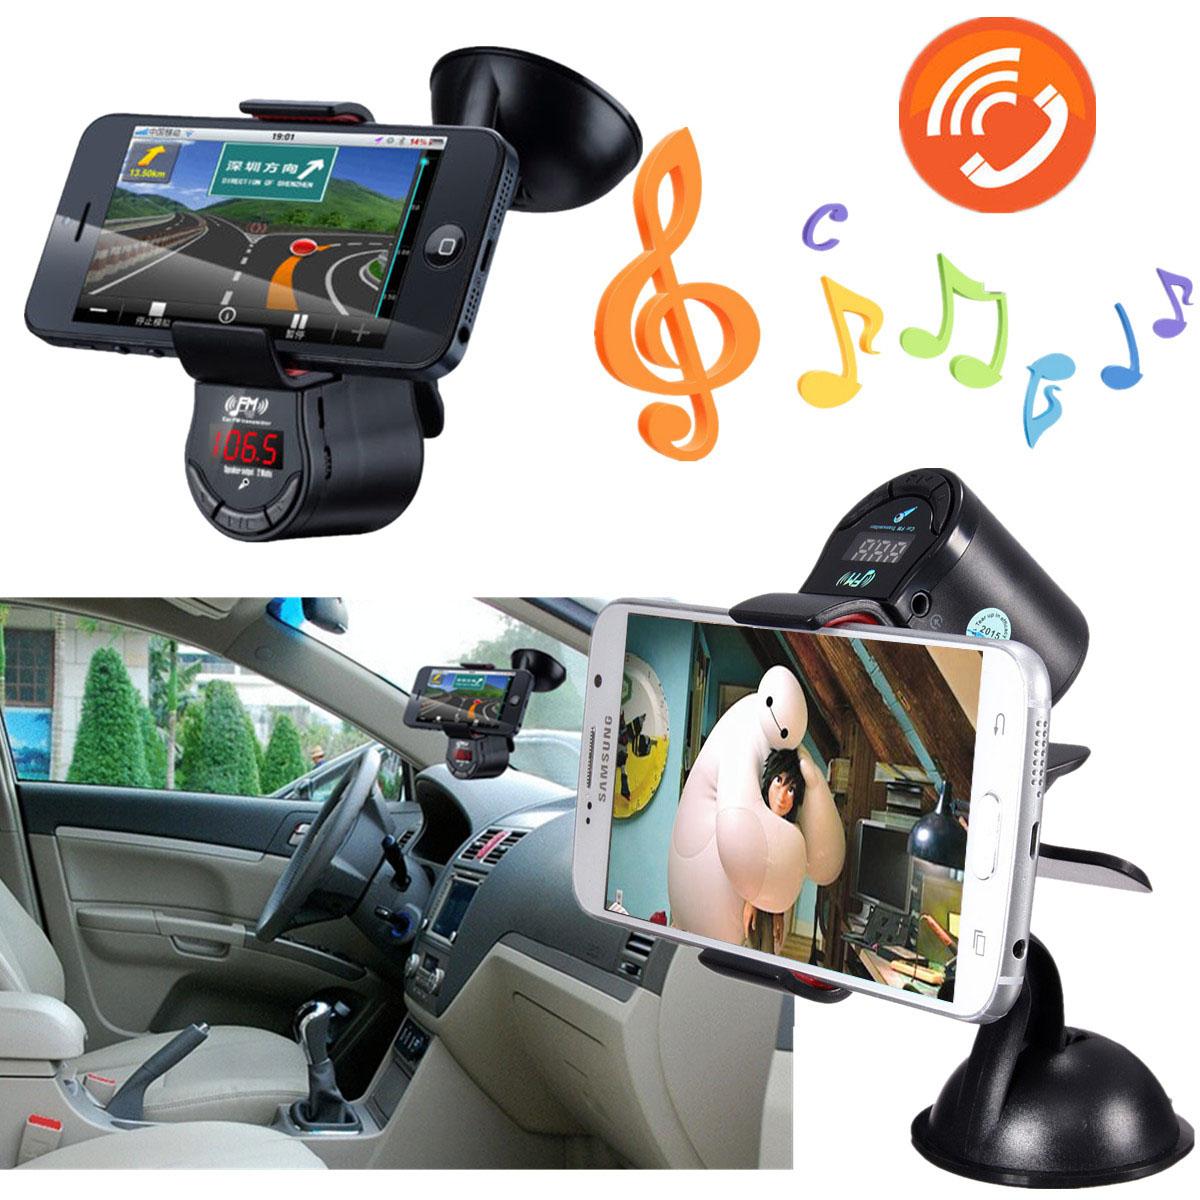 1 2 pcs k 80 hearing aid proth se auditif son amplificateur d 39 oreille adjustable ebay. Black Bedroom Furniture Sets. Home Design Ideas